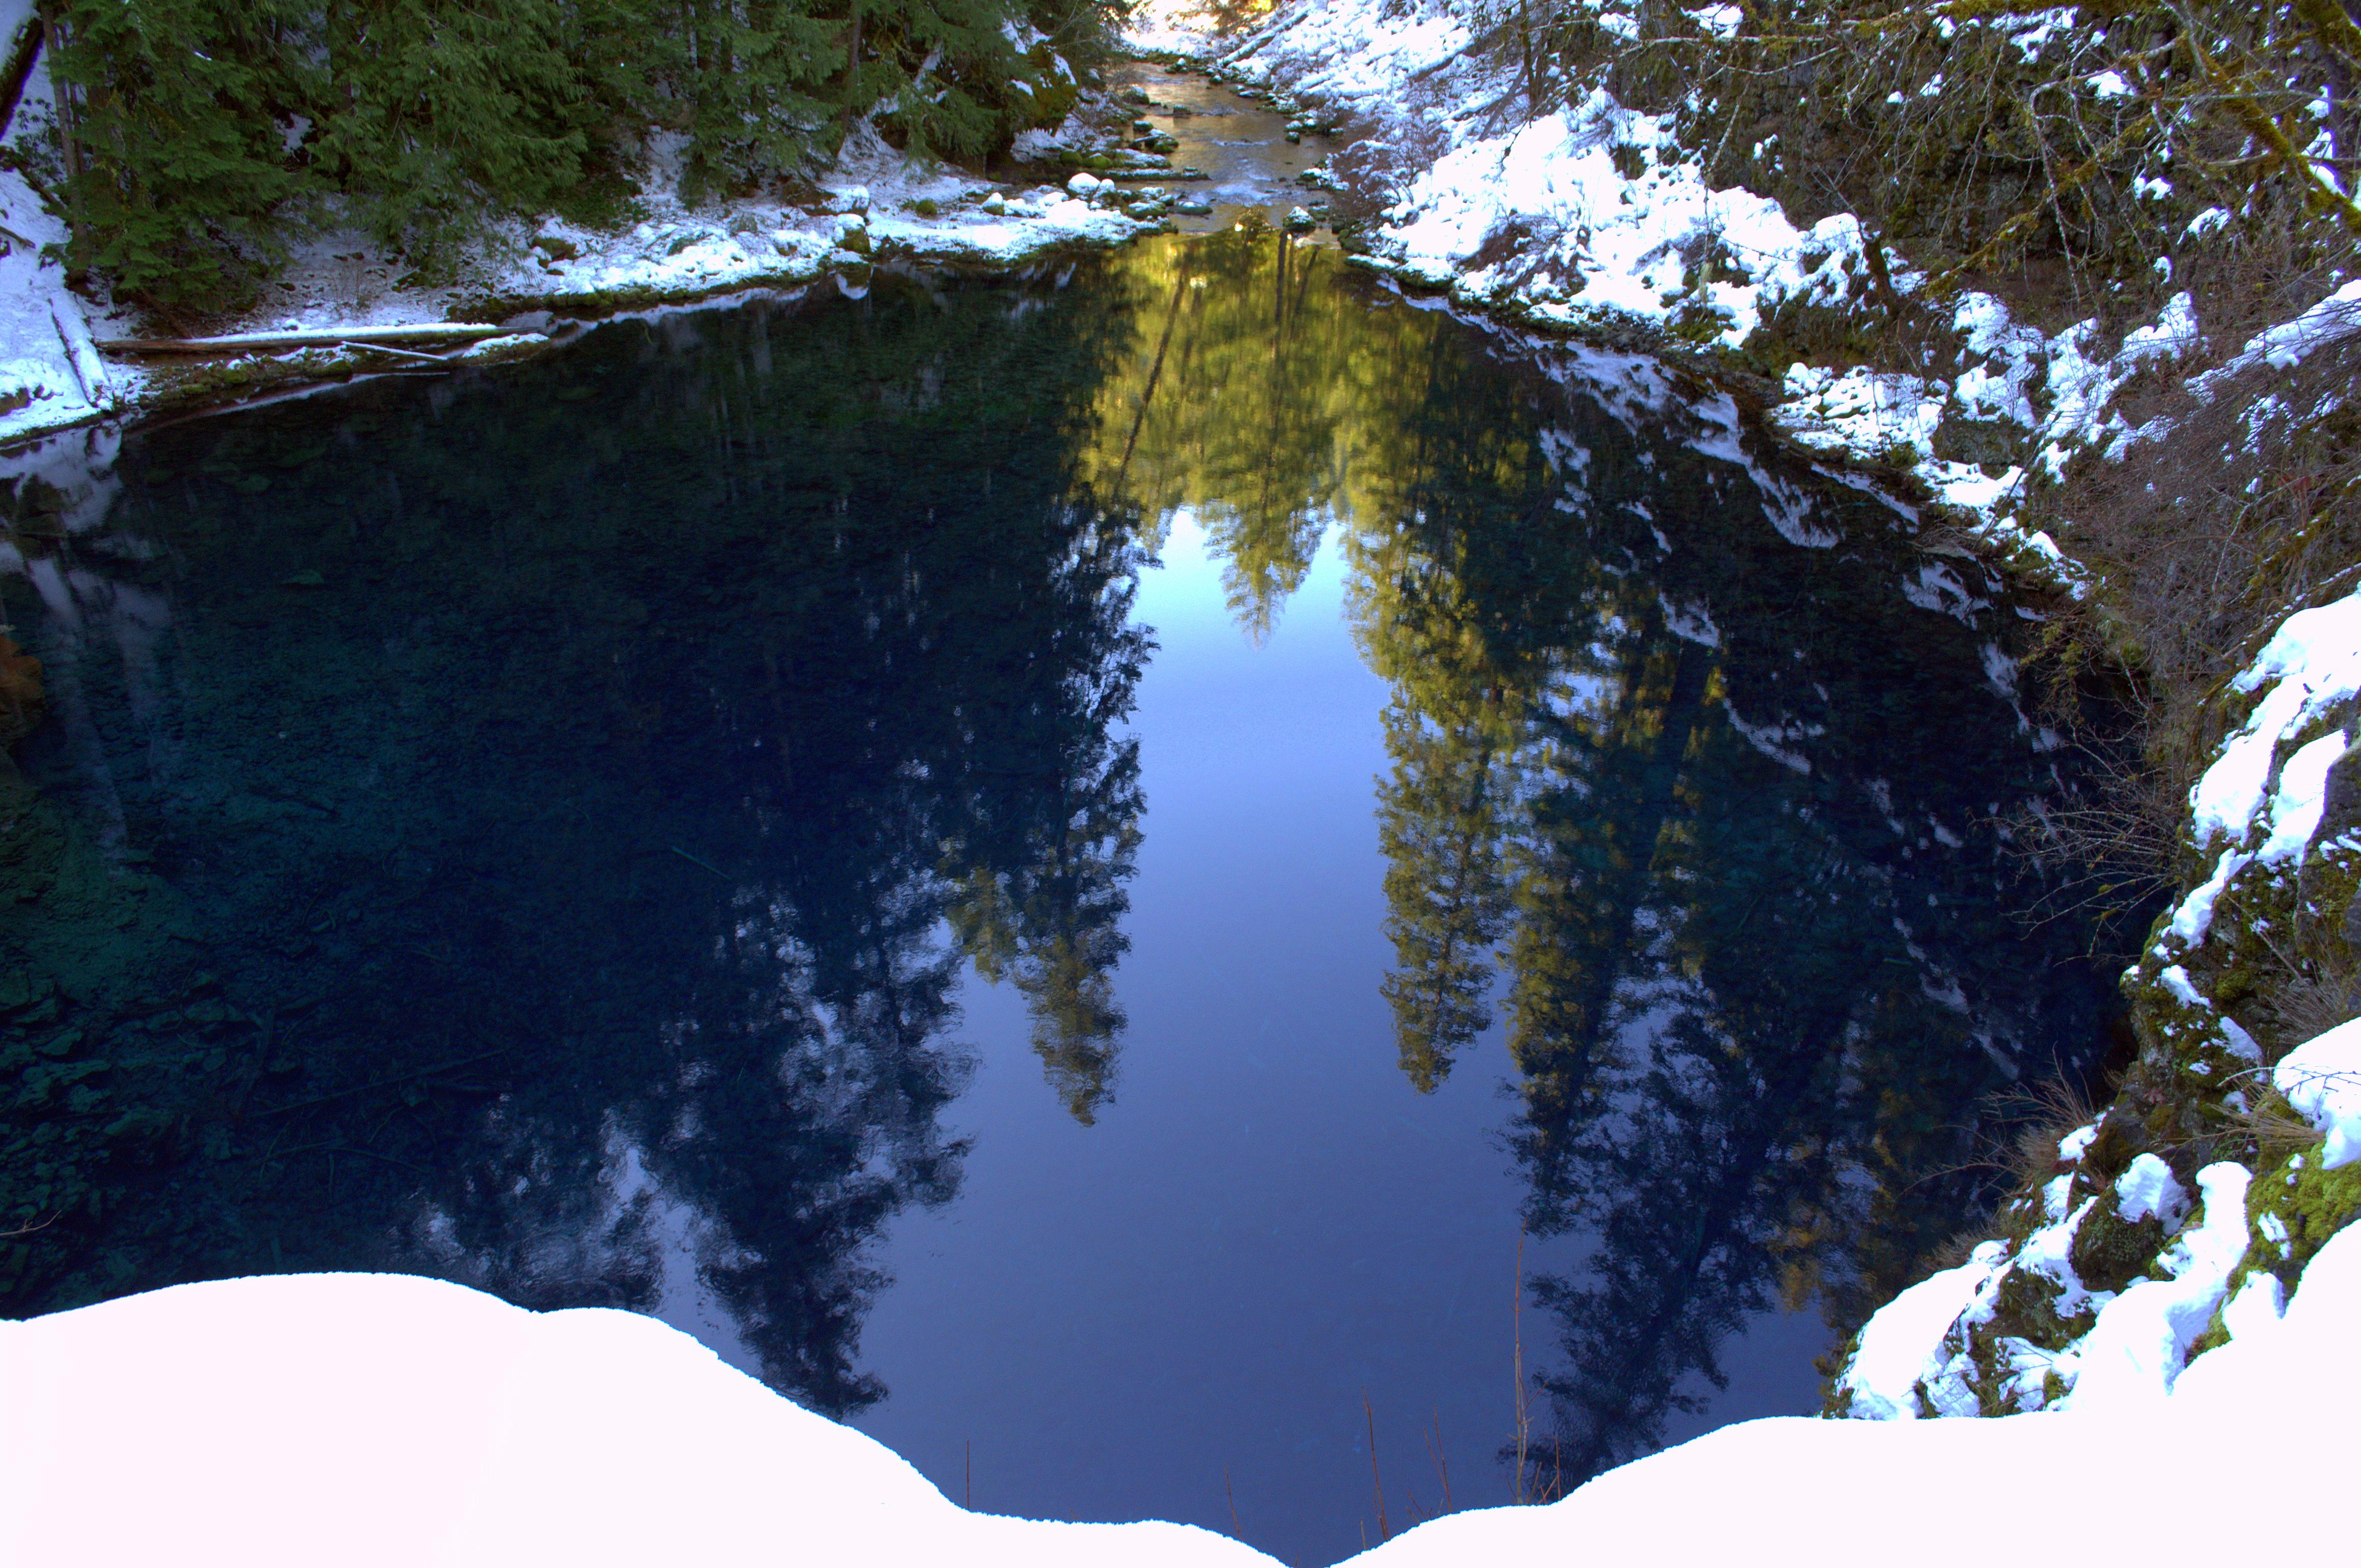 Mckenzie River Trail Trail Bridge To Tamolitch Pool Willamette National Forest Hiking In Oregon